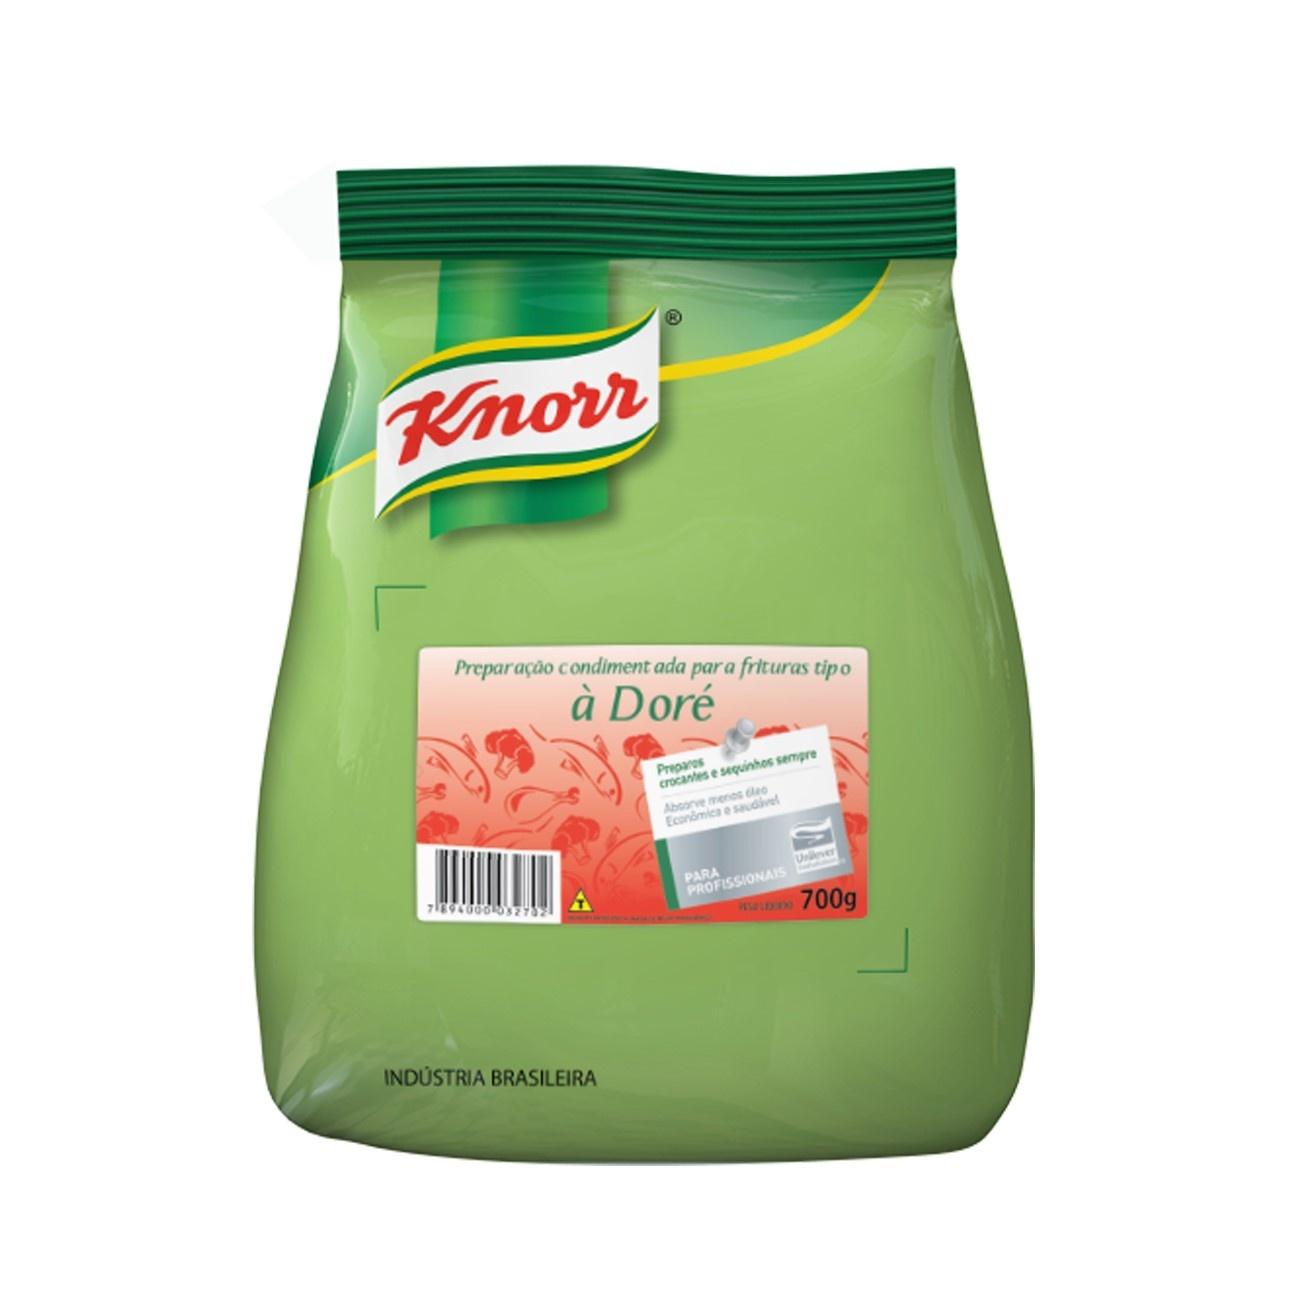 Mistura para Preparo à Dorê Knorr 700g | 1 unidades